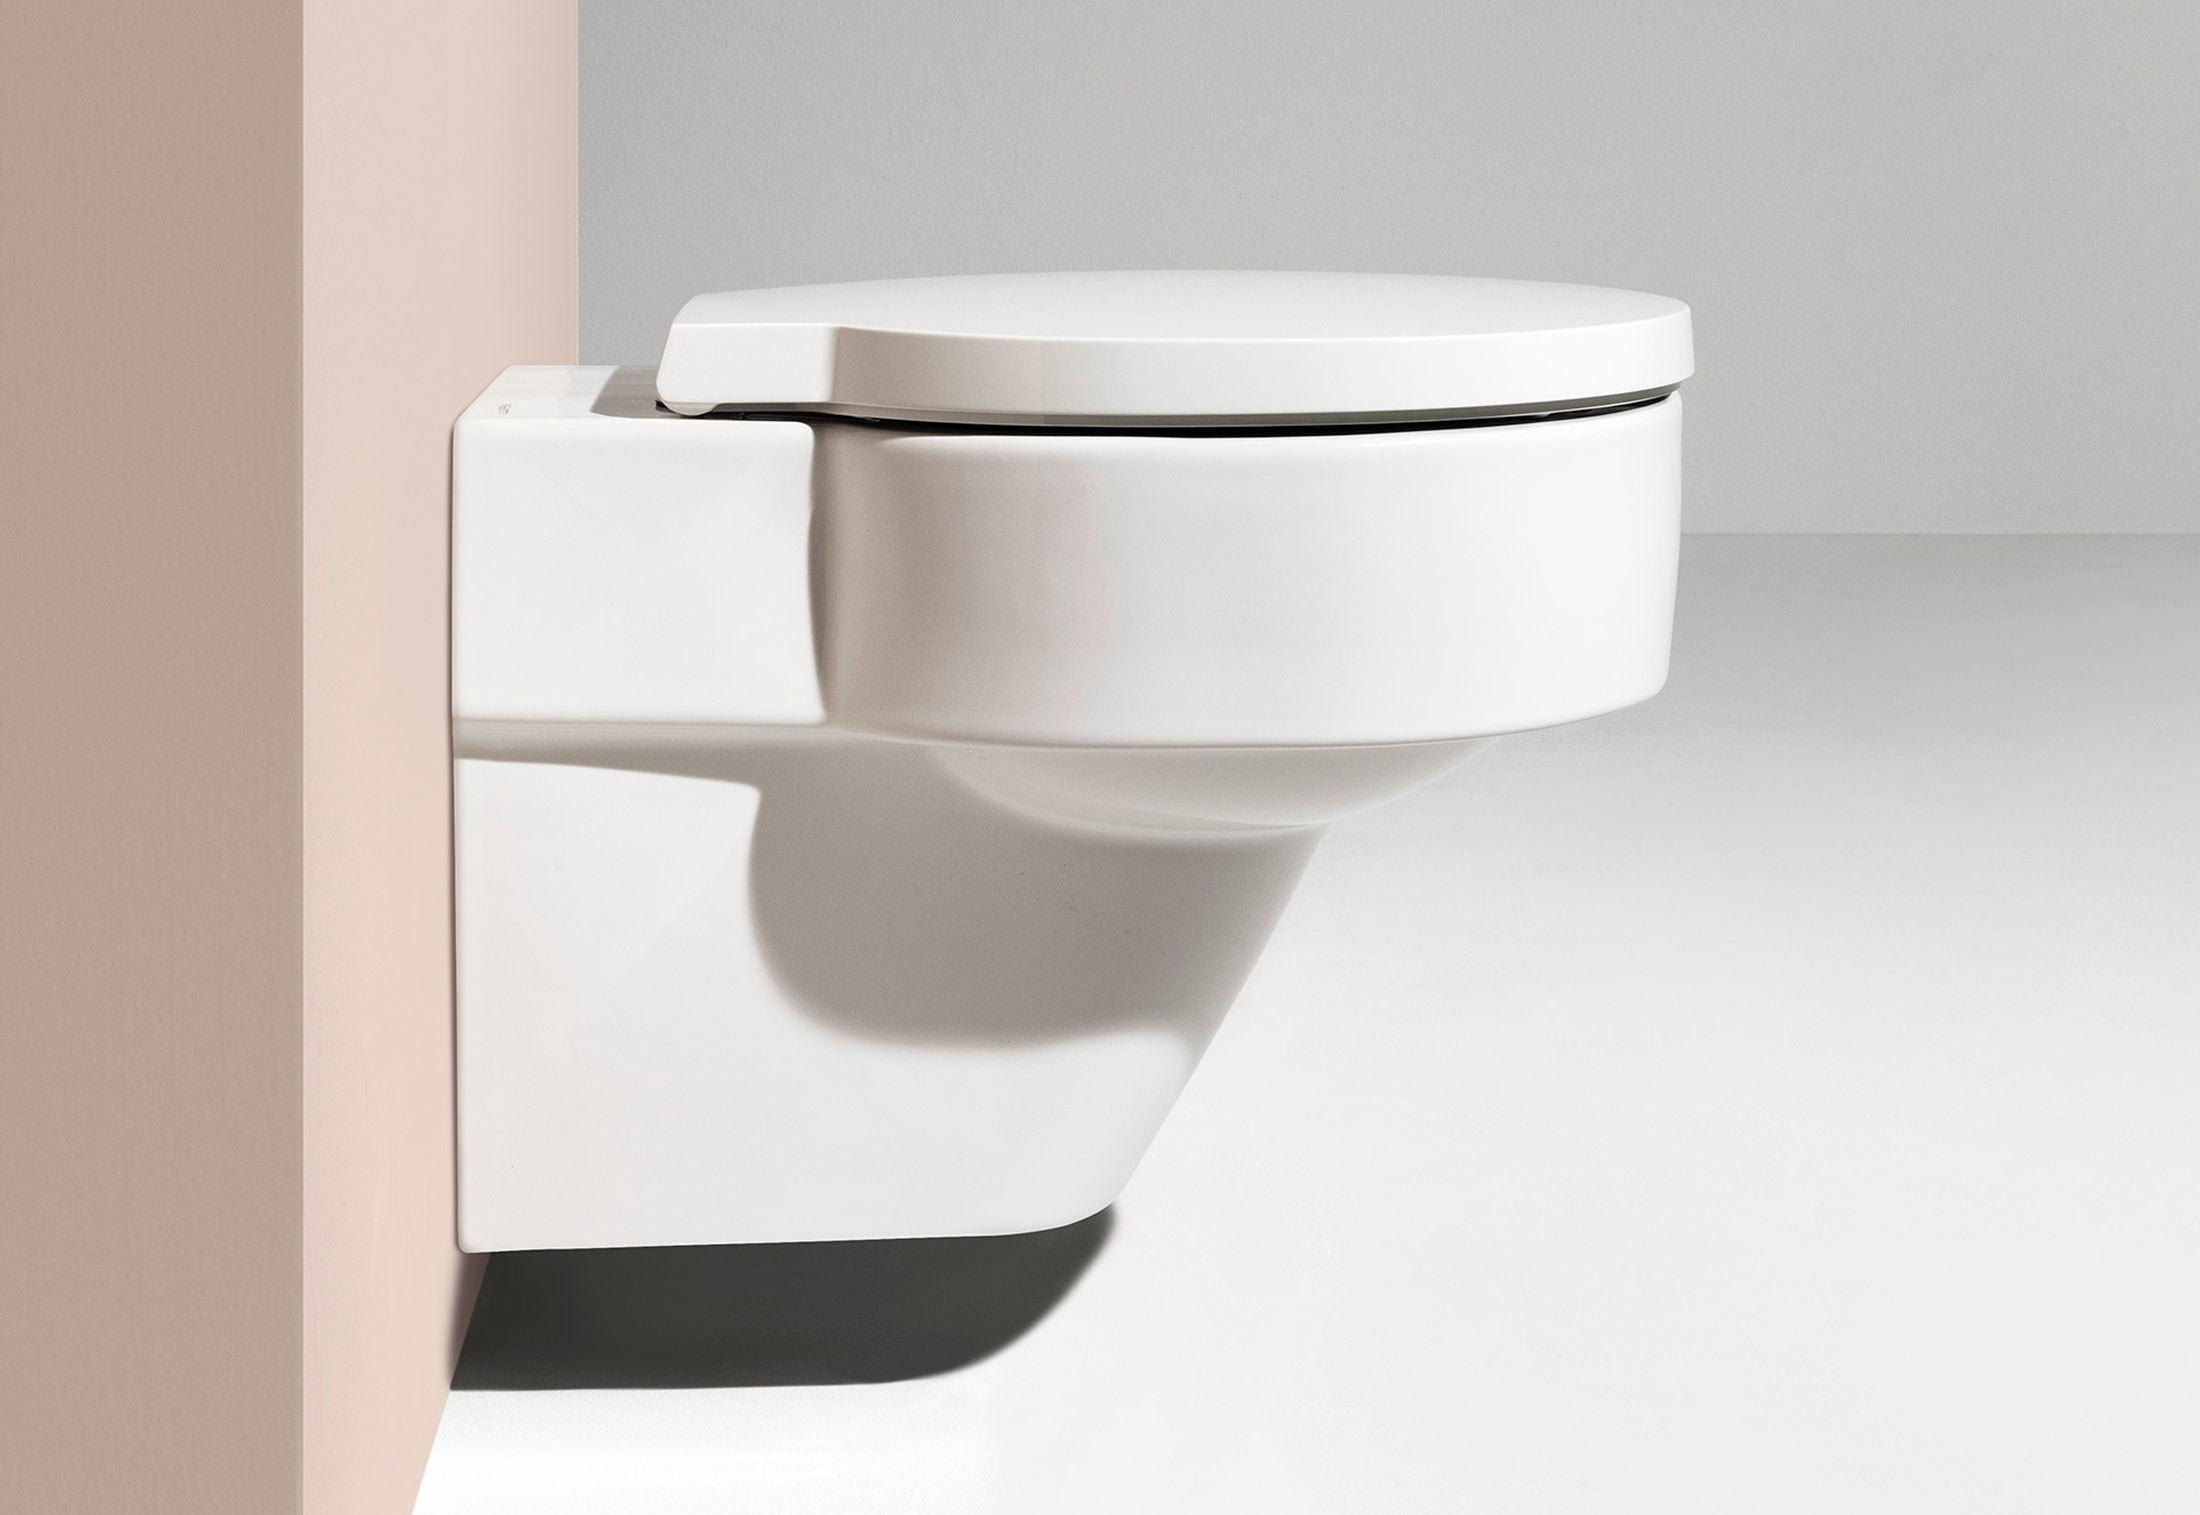 Cool Val Wand-WC, randlos von Laufen | STYLEPARK XE08